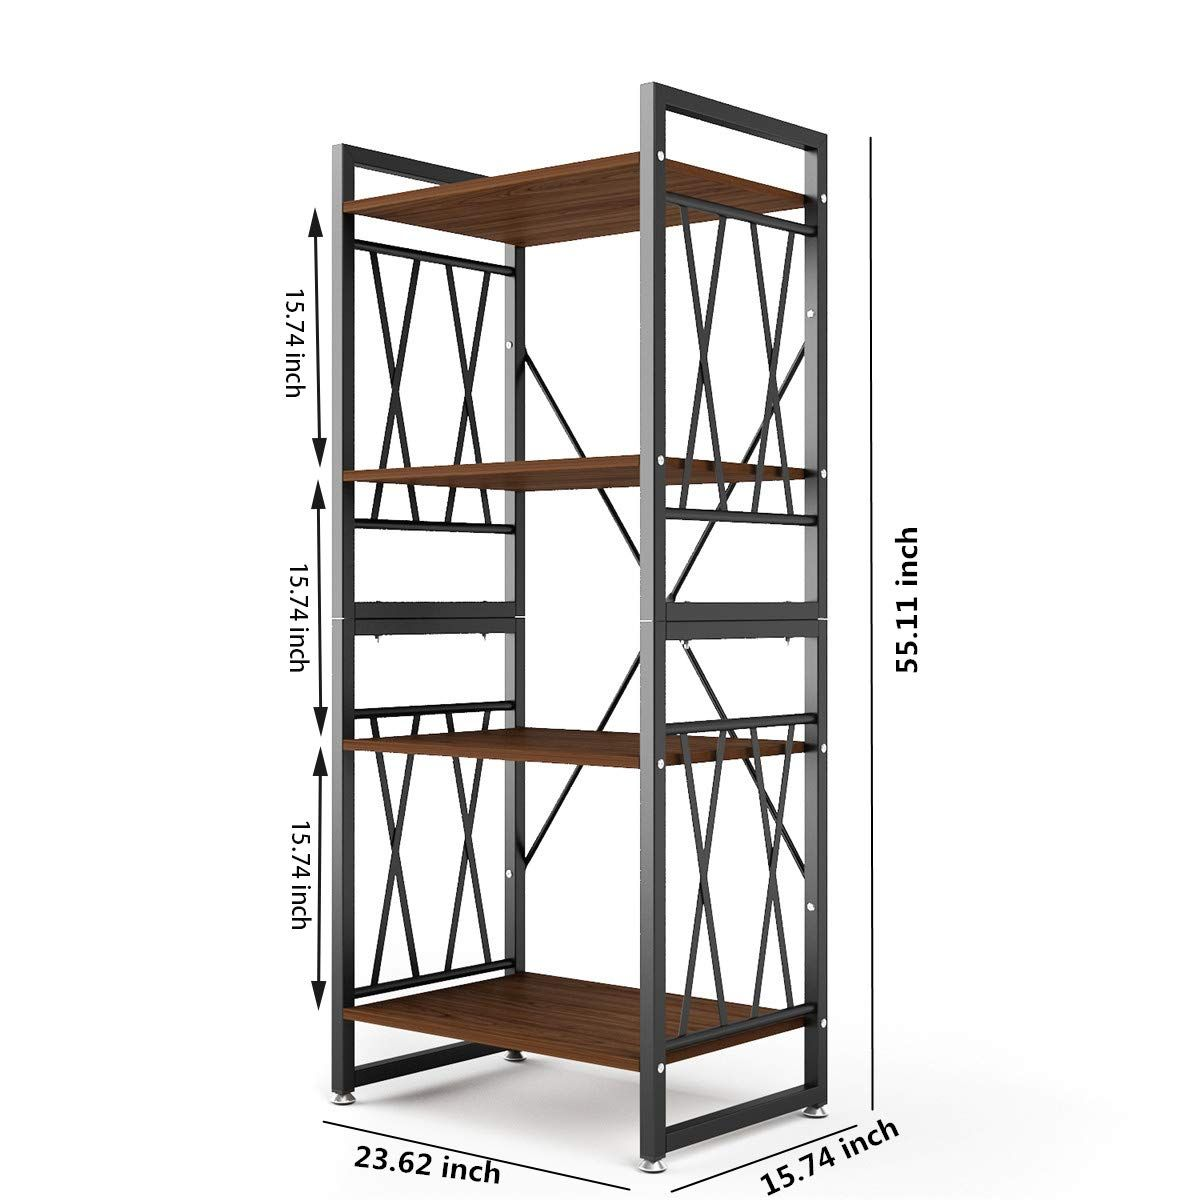 4 Shelf Bookshelf Industrial Bookshelf Ladder Bookshelf Storage Rack Shelves Metal And Wood Bookcase 55 Ta In 2020 Wood Bookcase Living Room Furniture Styles Shelves